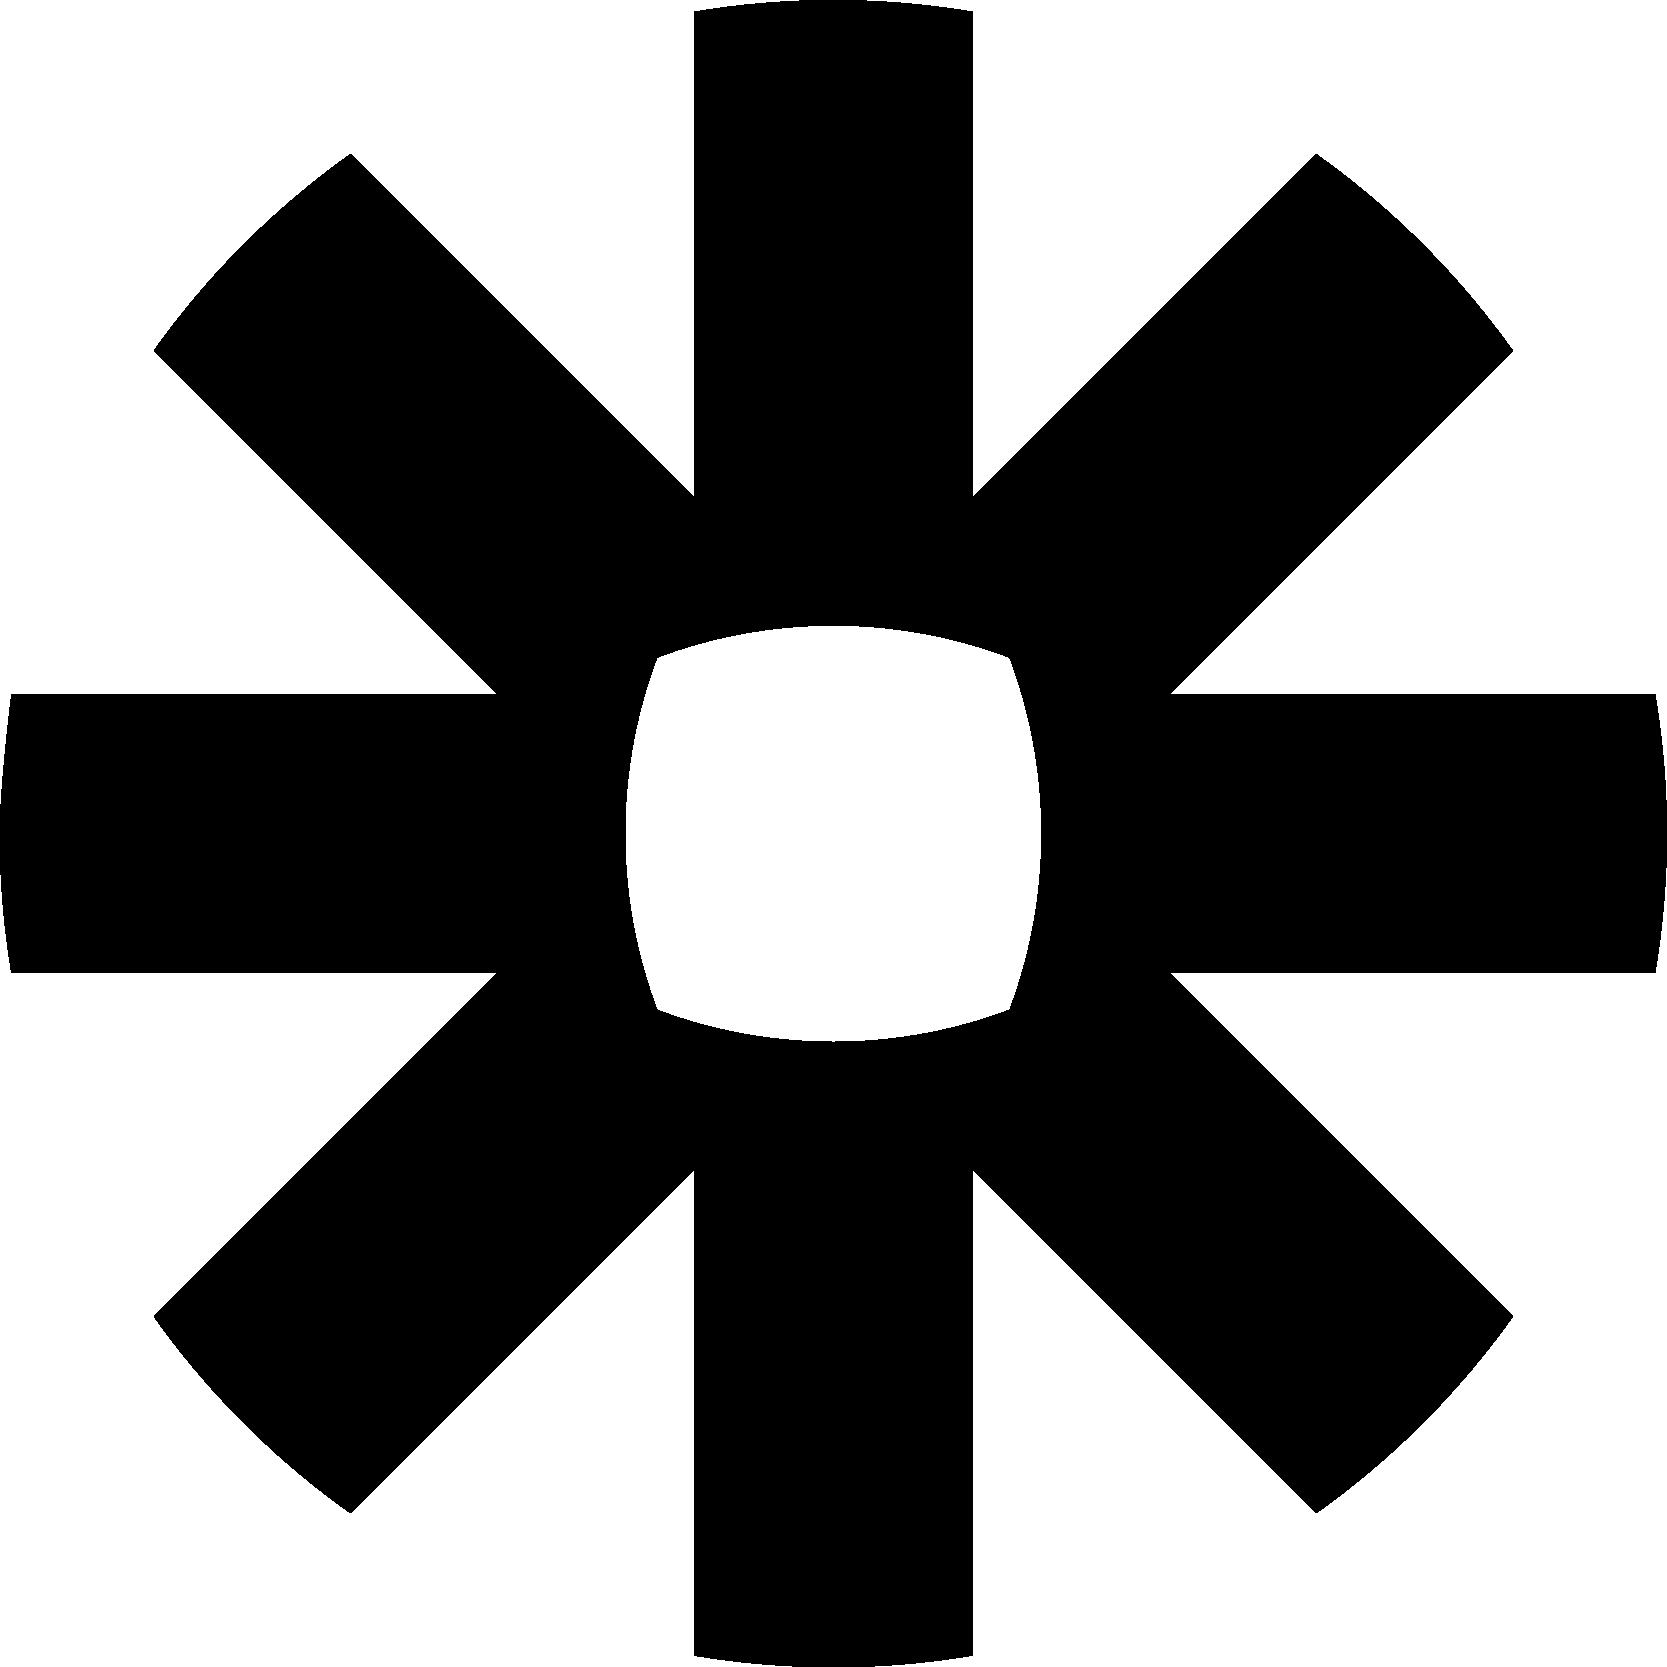 _brand_assets_images_logos_zapier-logomark-monochrome.png